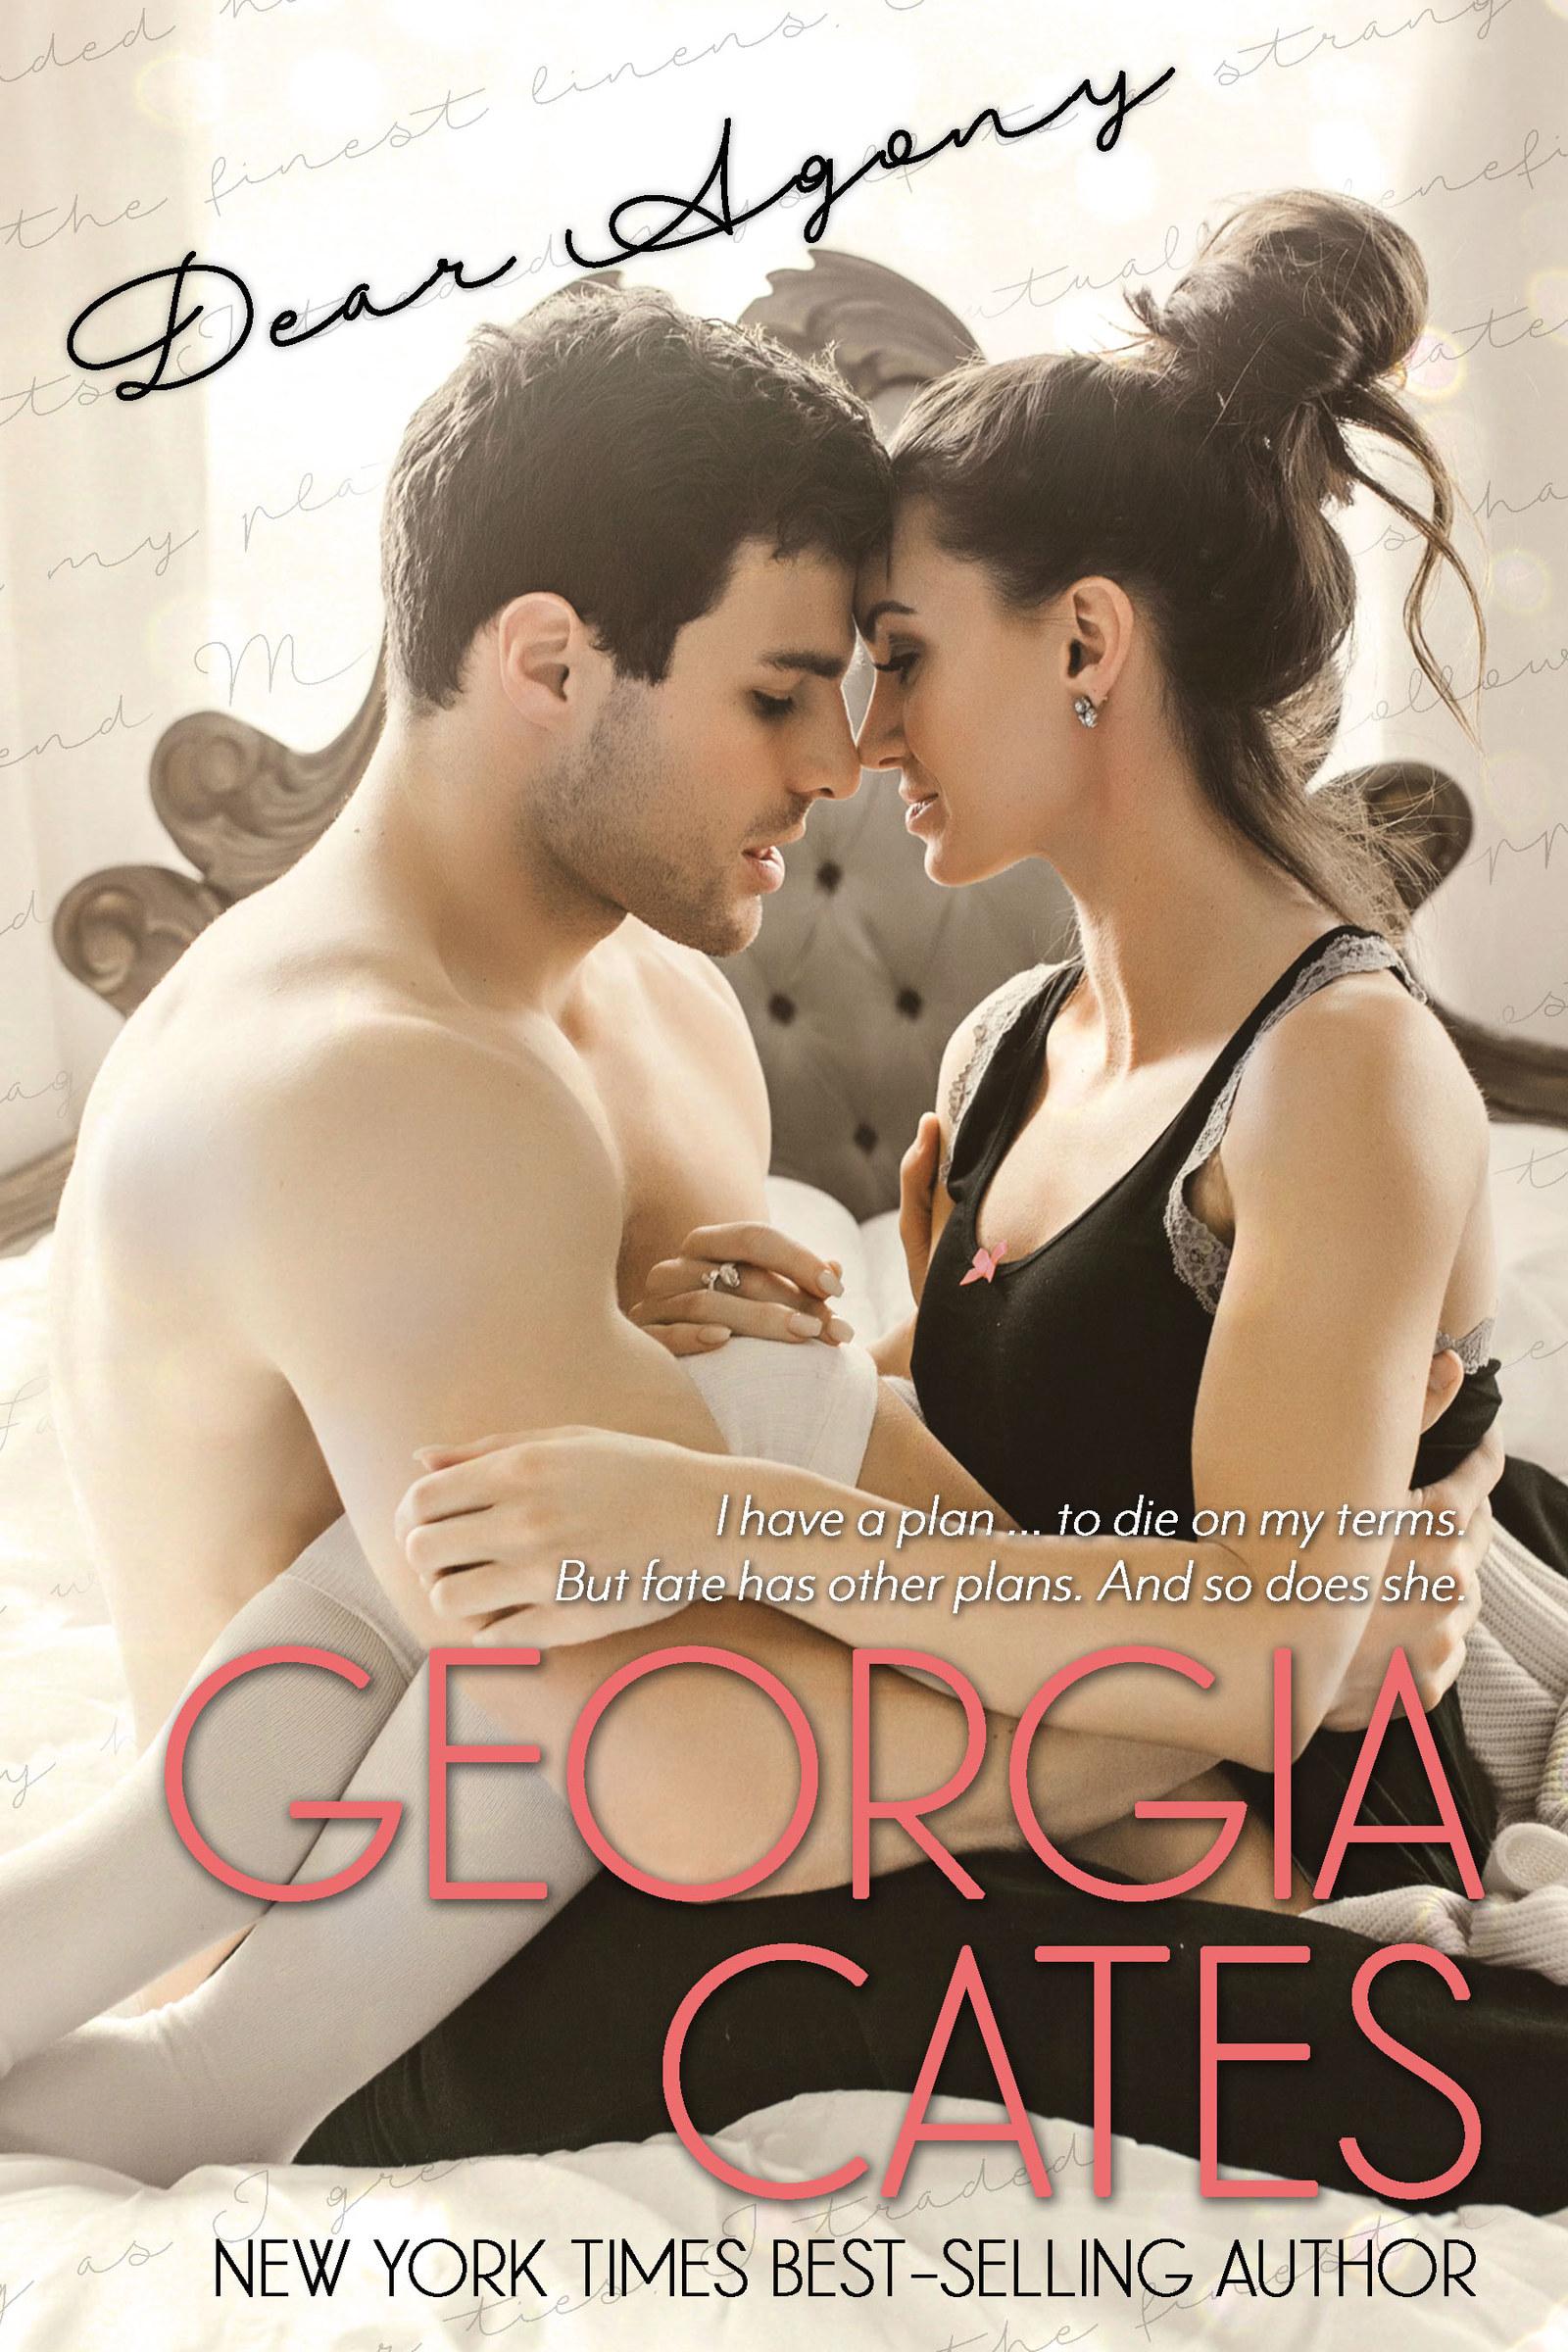 Fiction romantic women erotic fiction online free quality